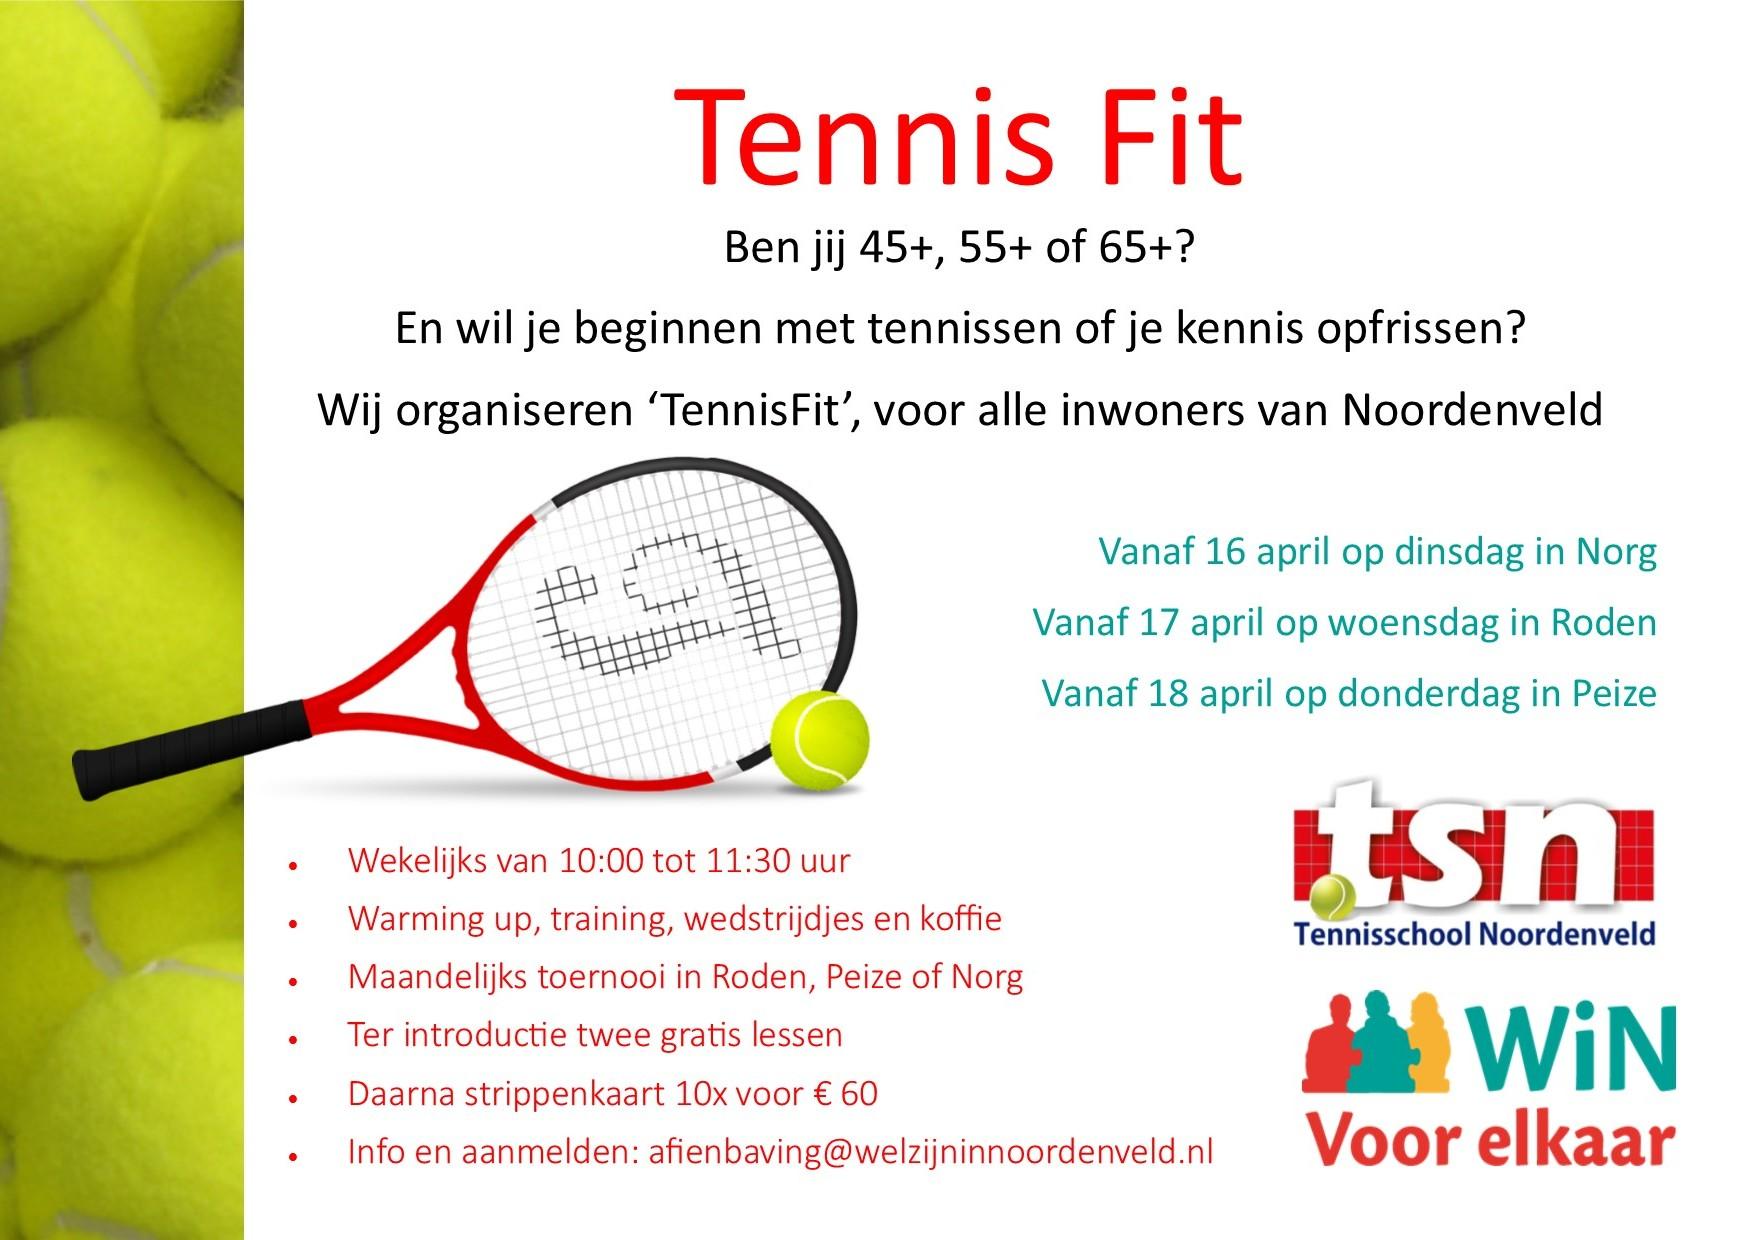 Tennisfit